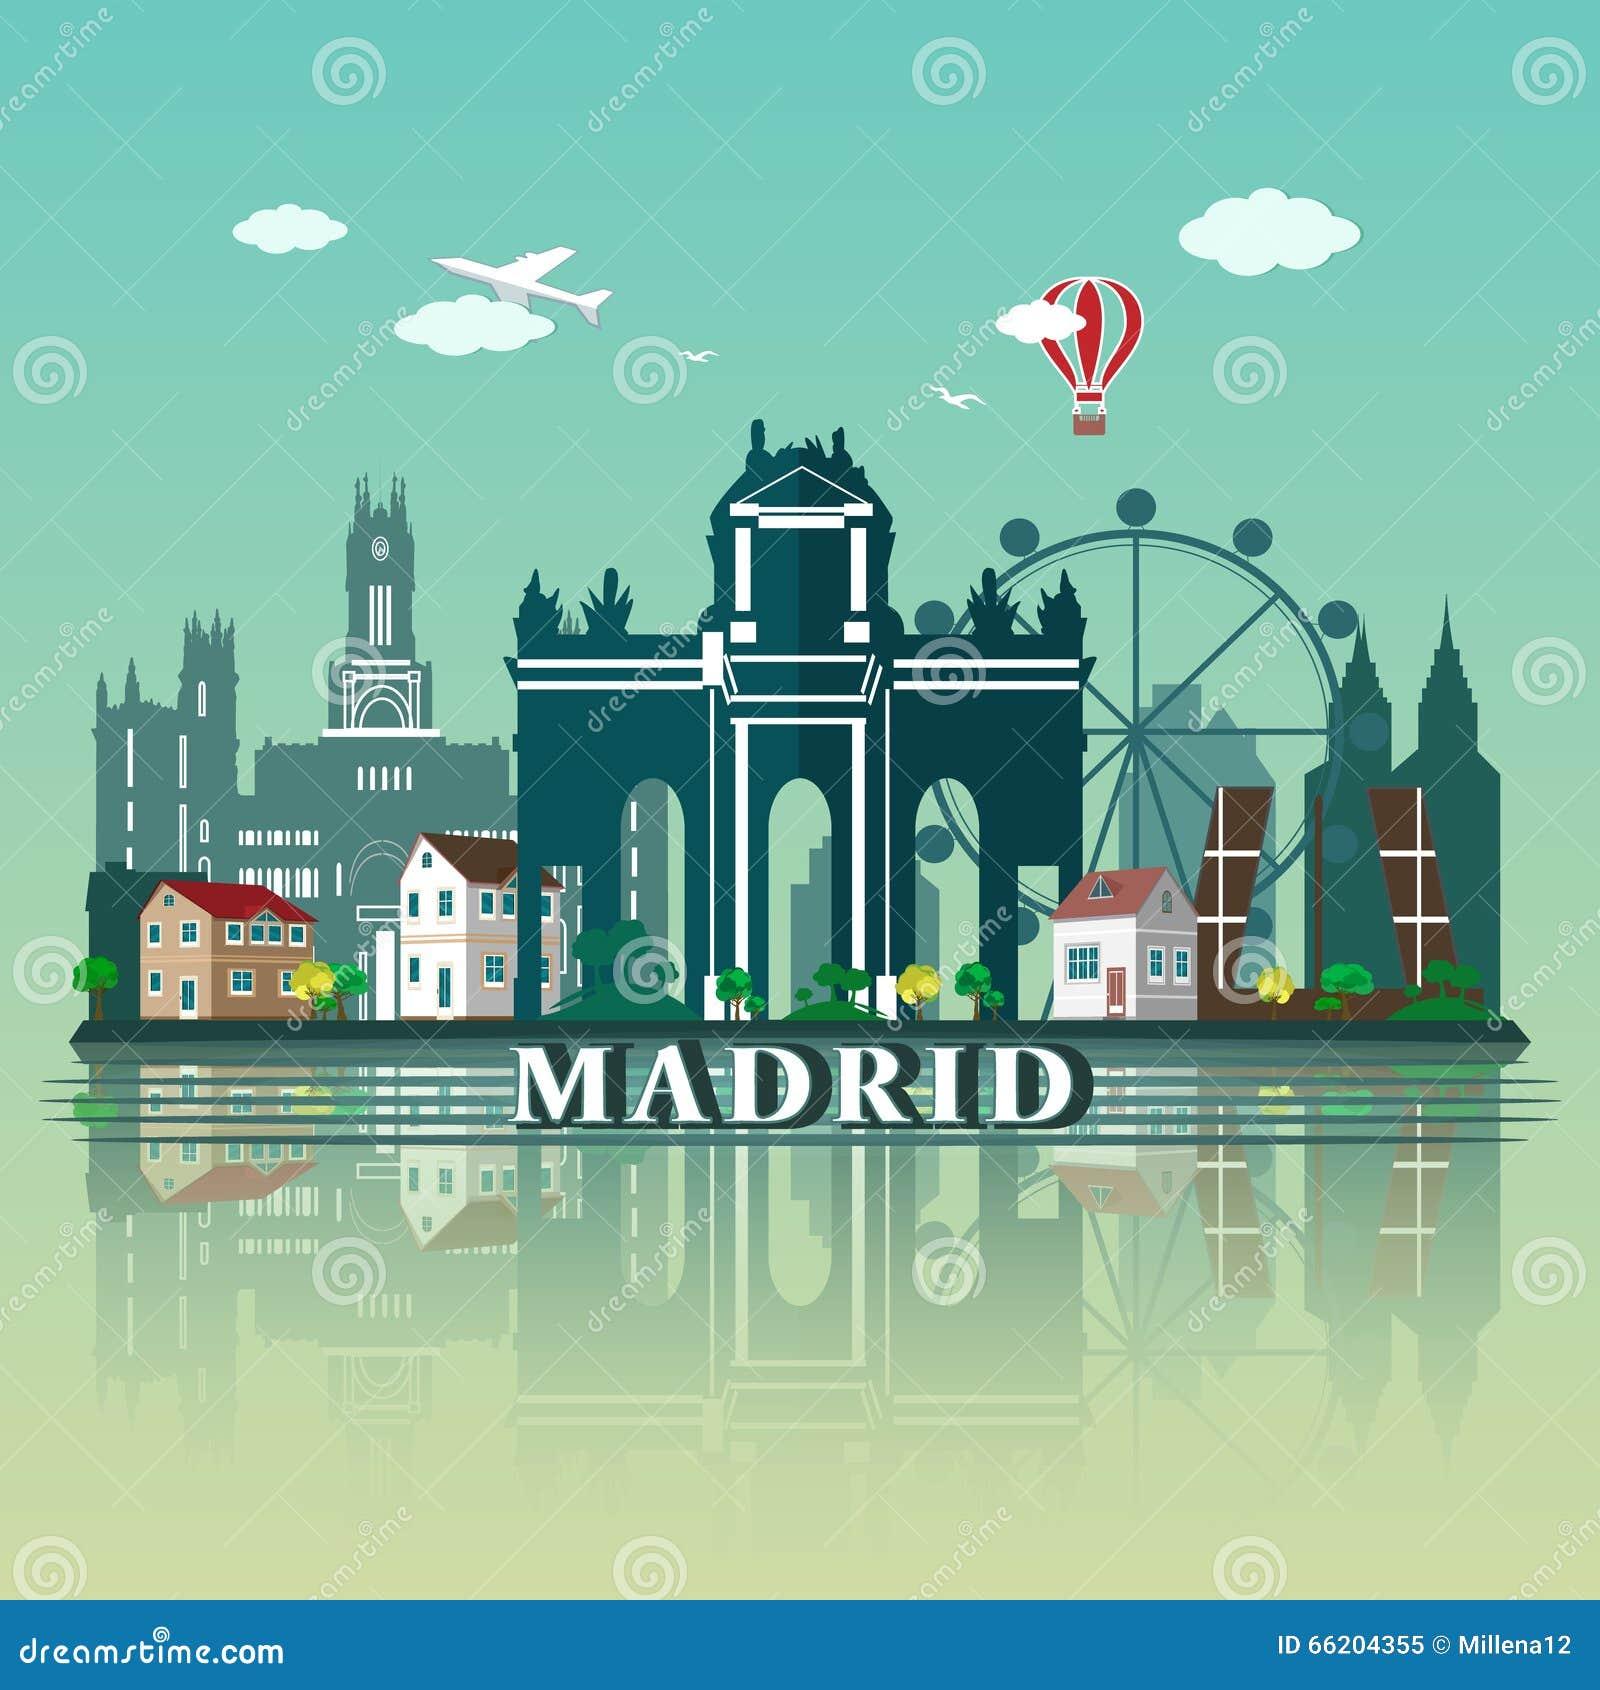 Modern Madrid City Skyline Design. Spain